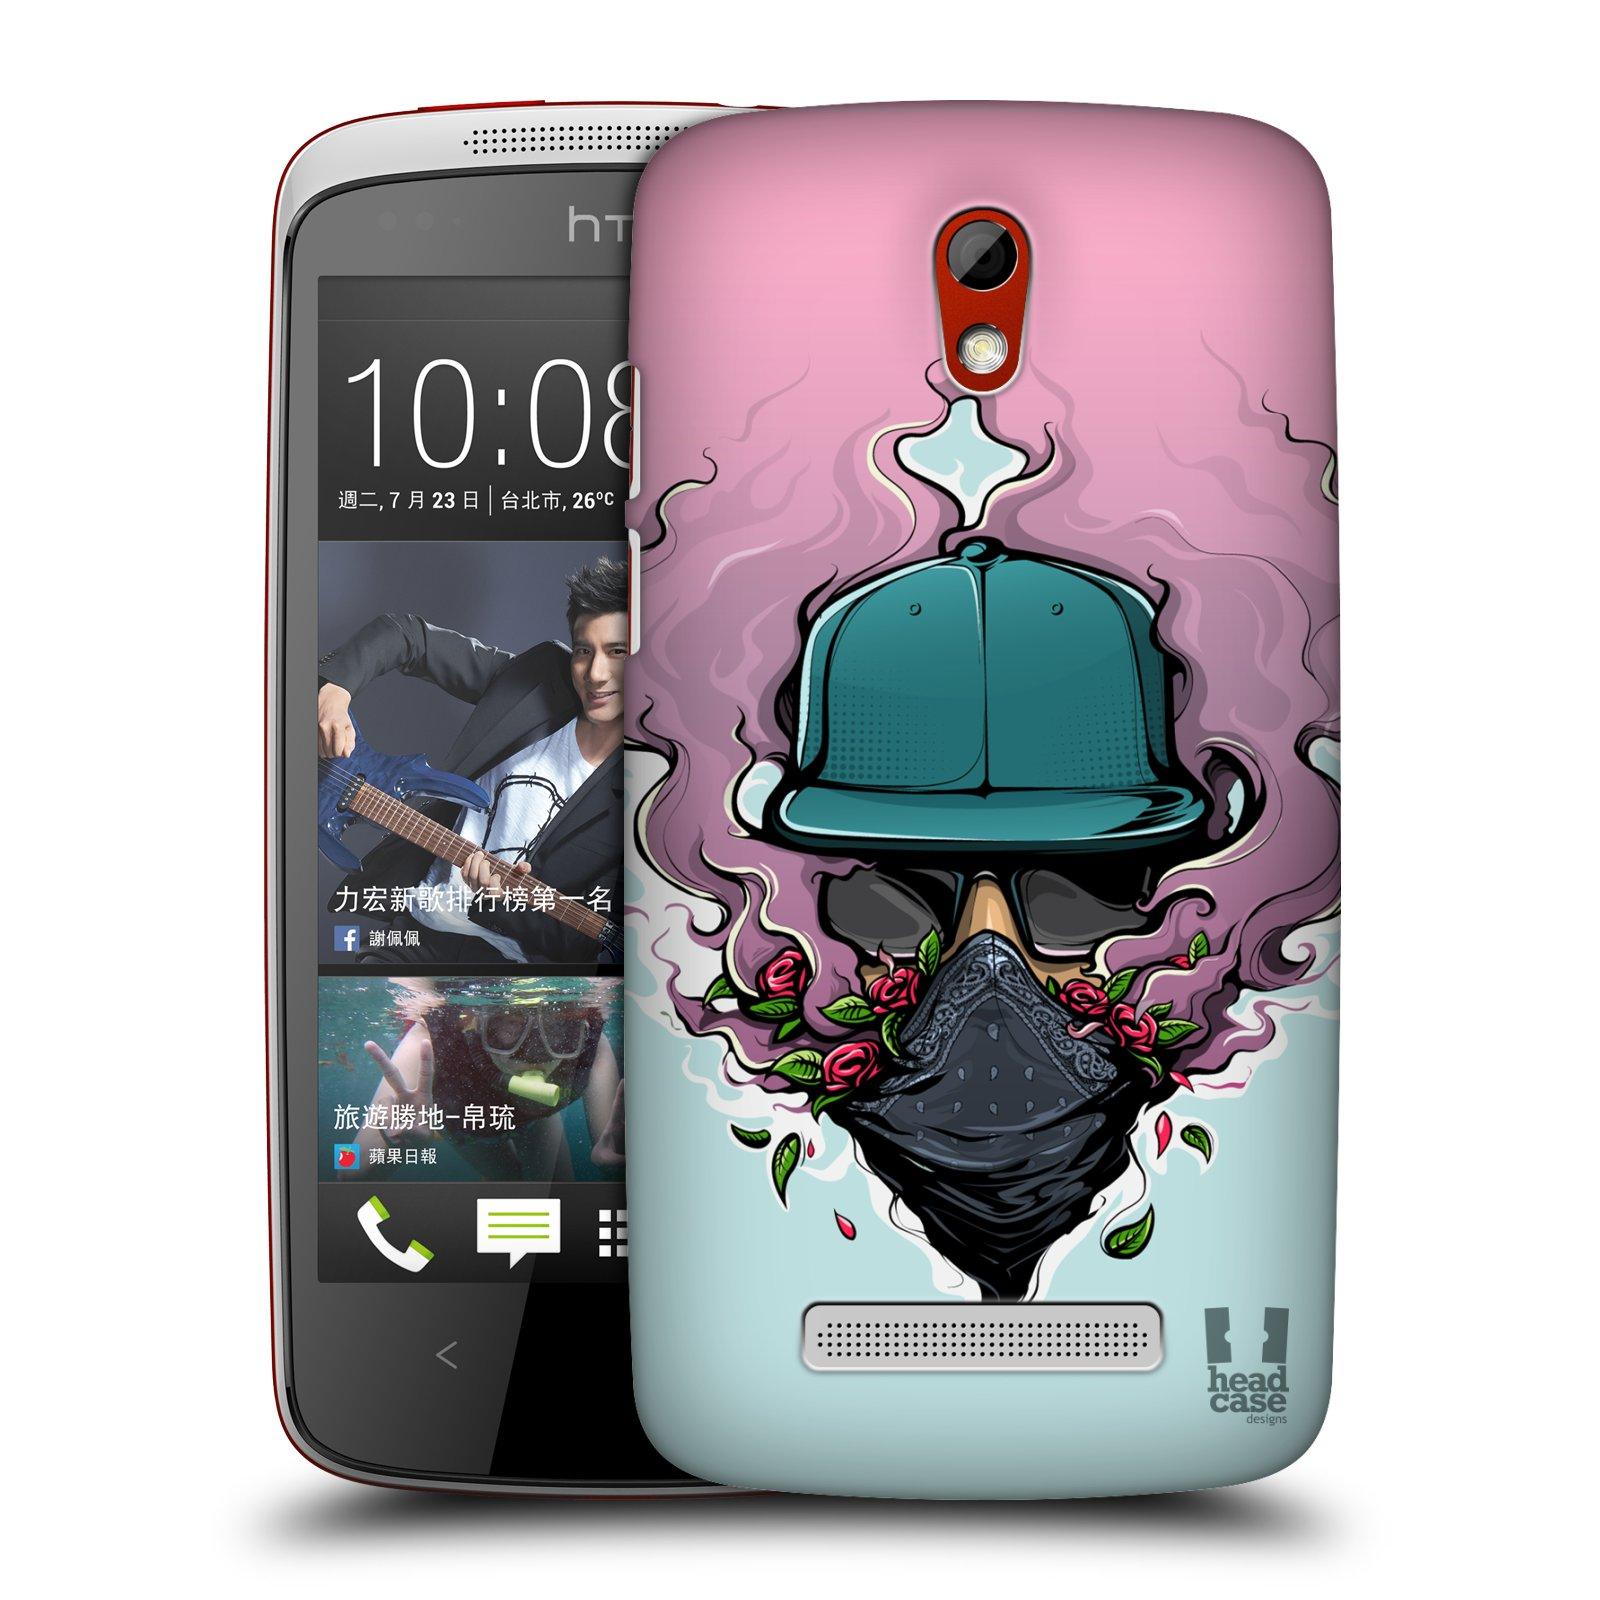 Case Designs urbano VIBES duro HEAD Funda trasera para teléfonos HTC 2